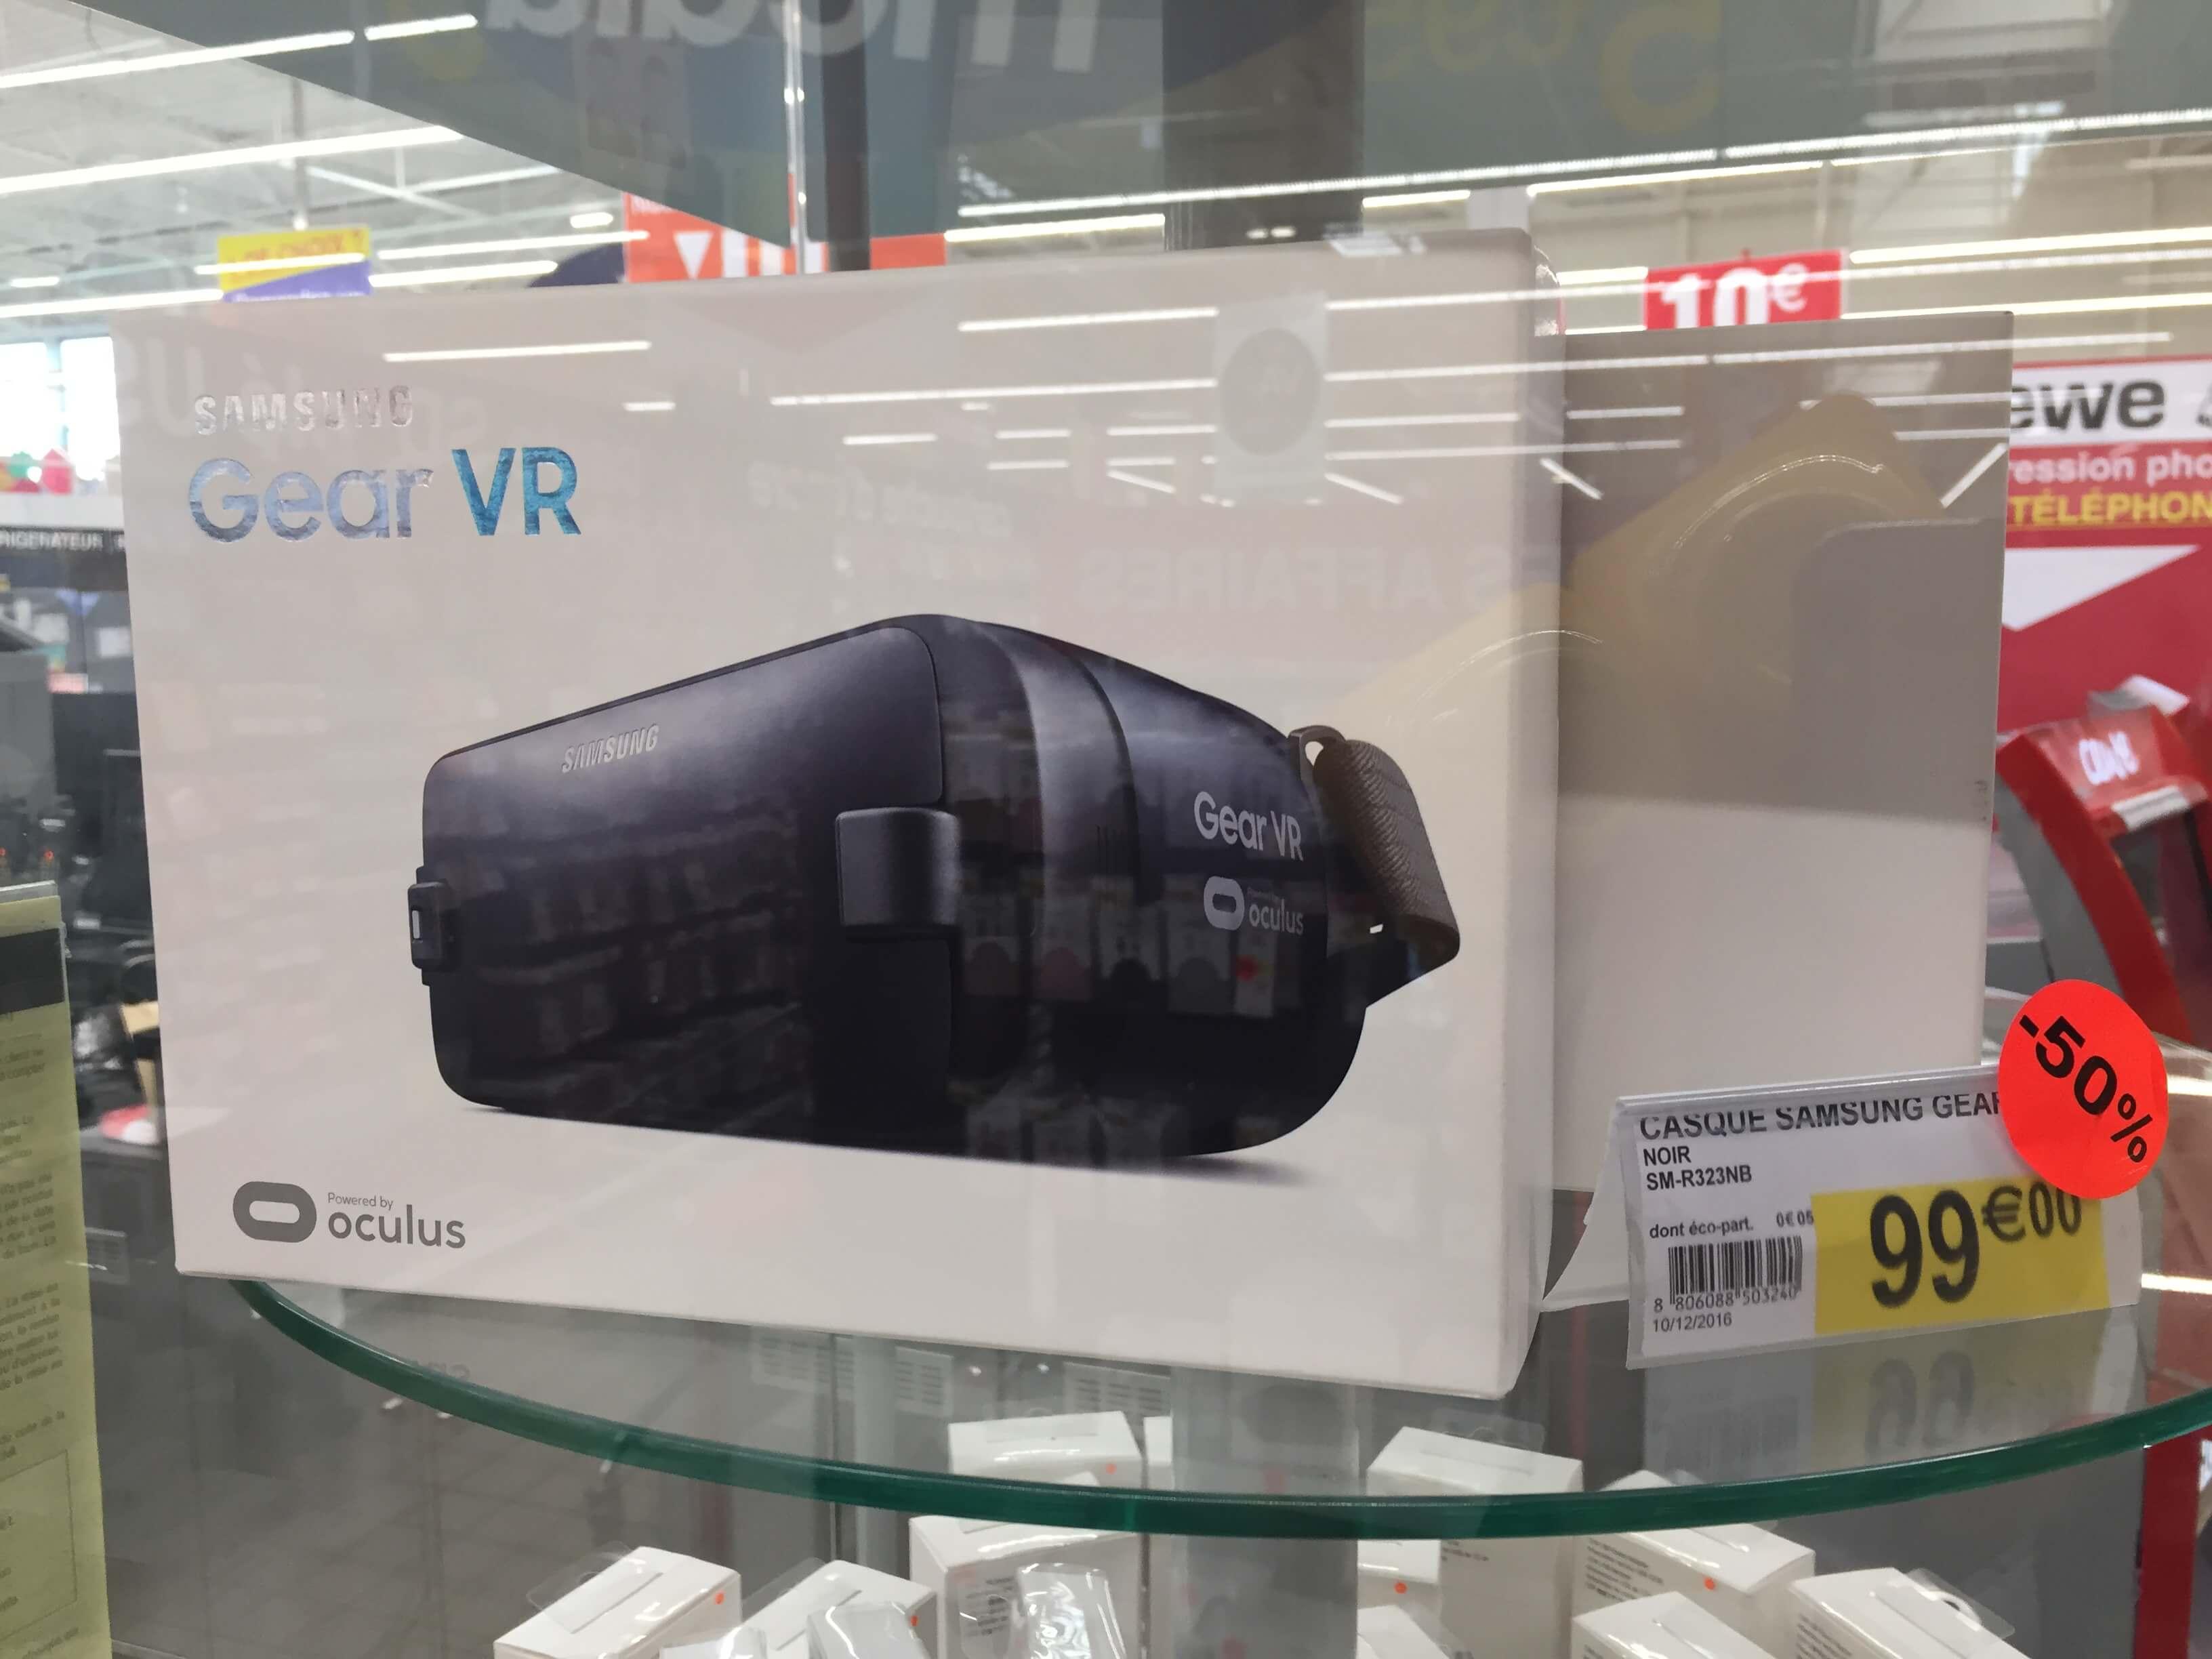 Casque de réalité augmentée Oculus Gear VR Samsung - Caen (14)